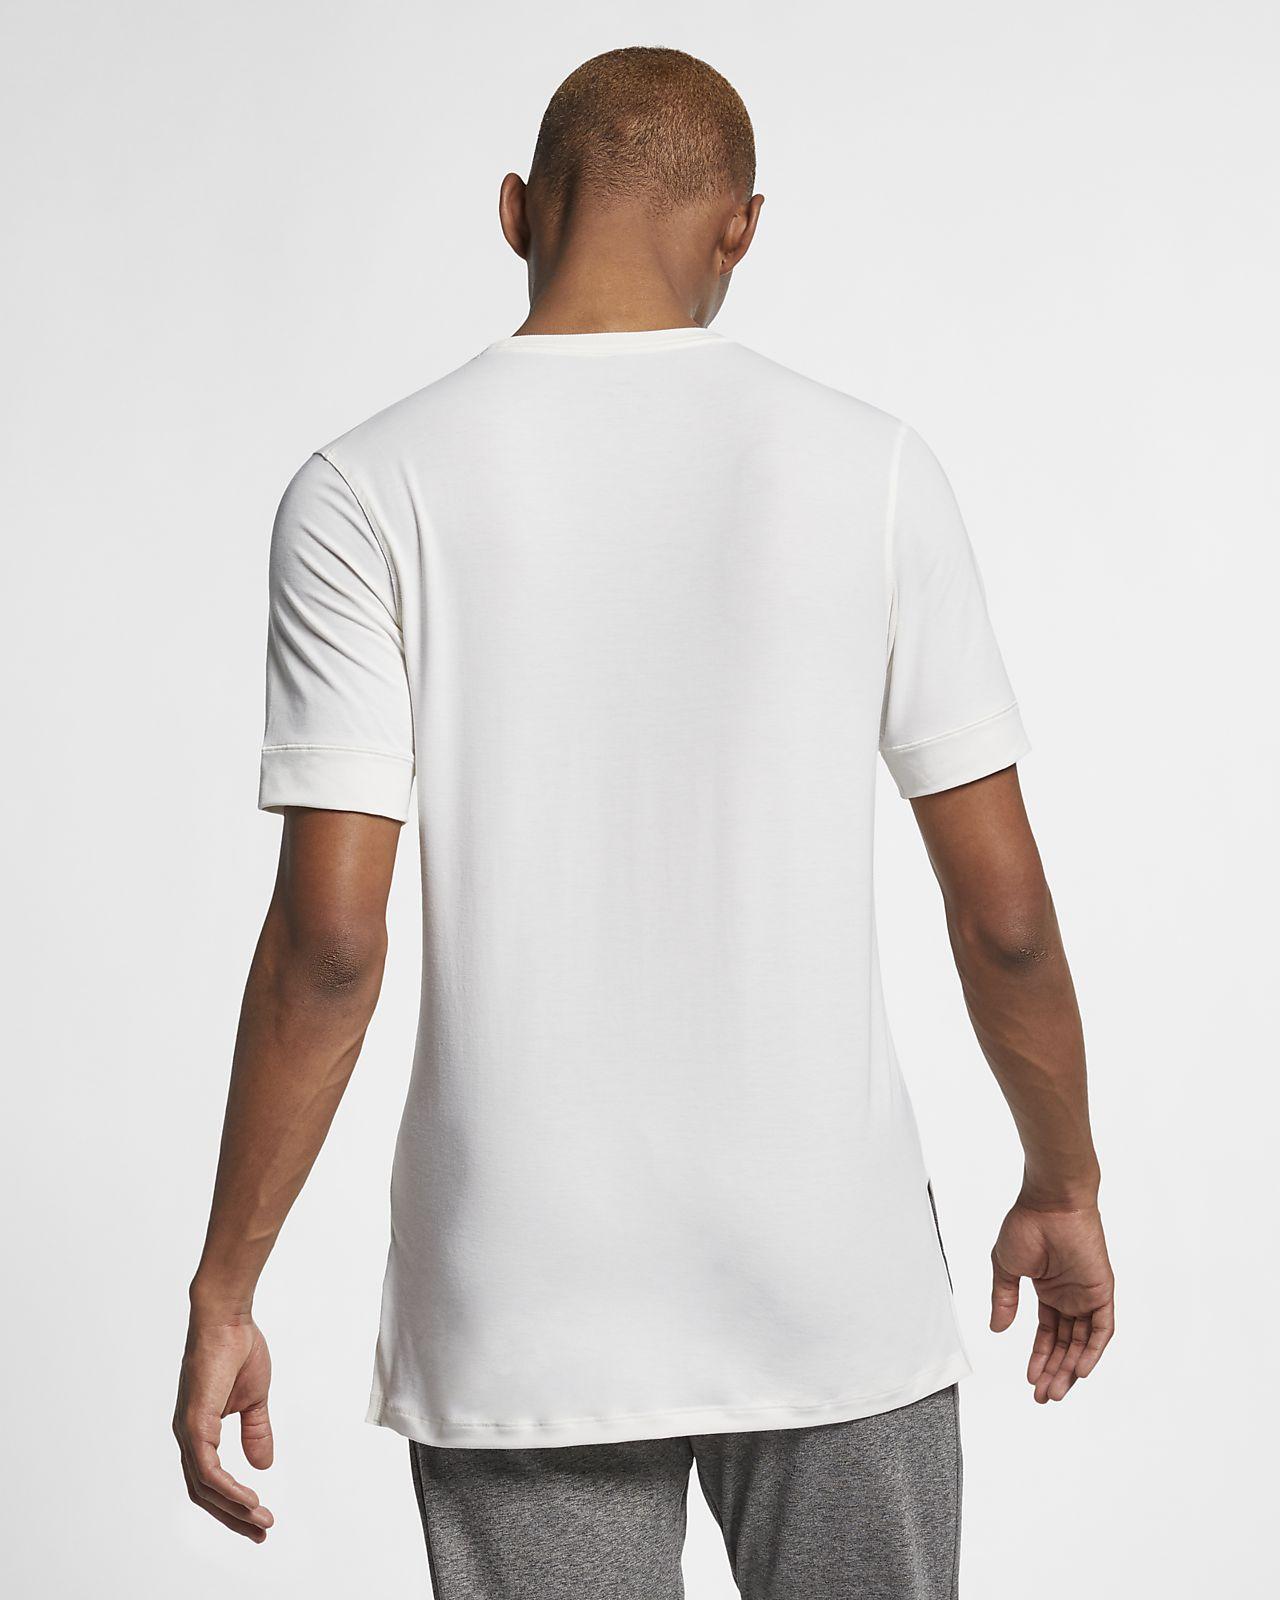 Nike Maglia Running Manica Corta Air Bianco Nero Uomo